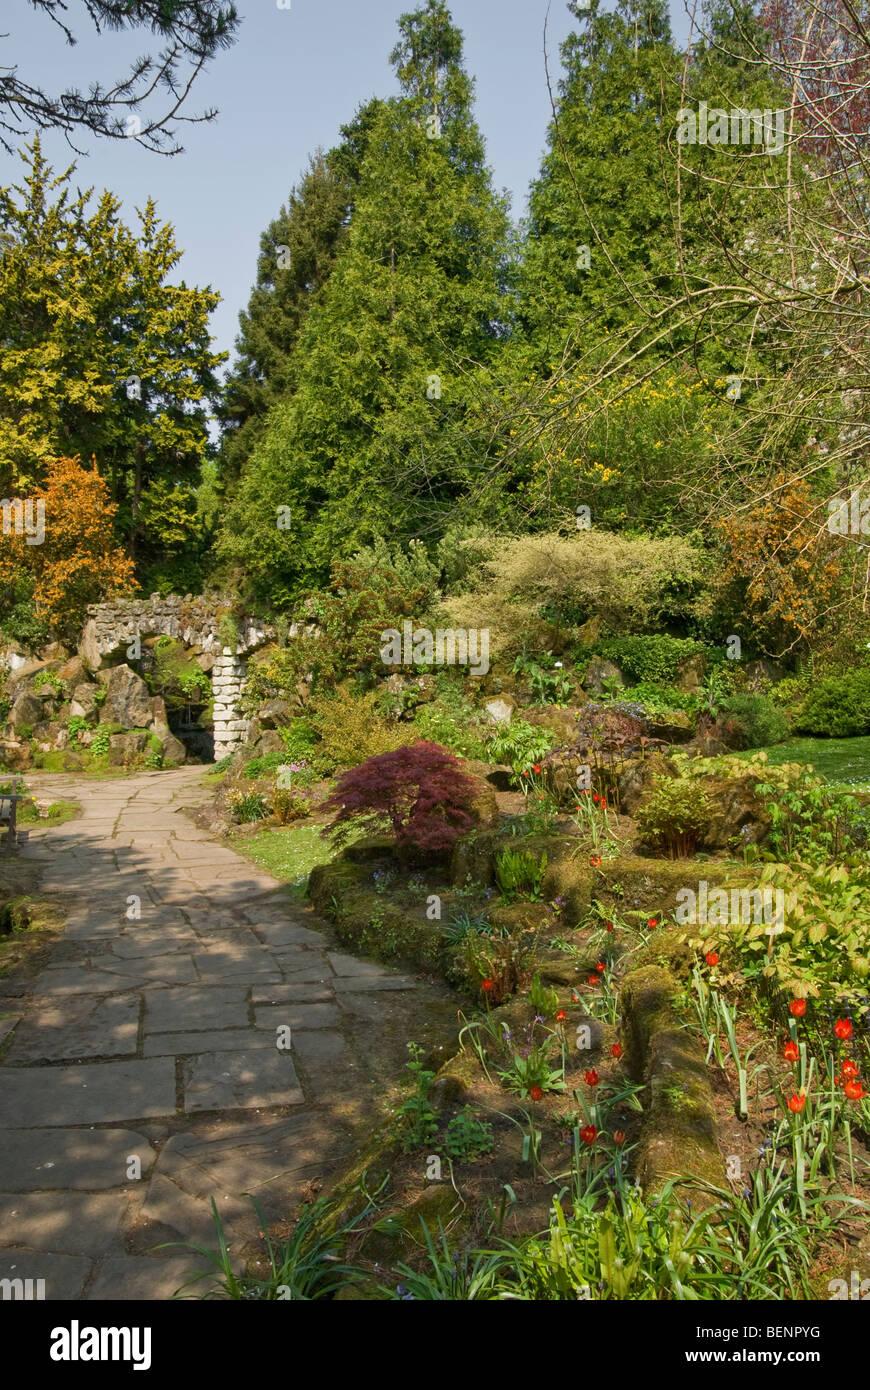 tulips moss ferns stone arch conifers epimedium acer [Newby Hall] Ripon [North Yorkshire] - Stock Image